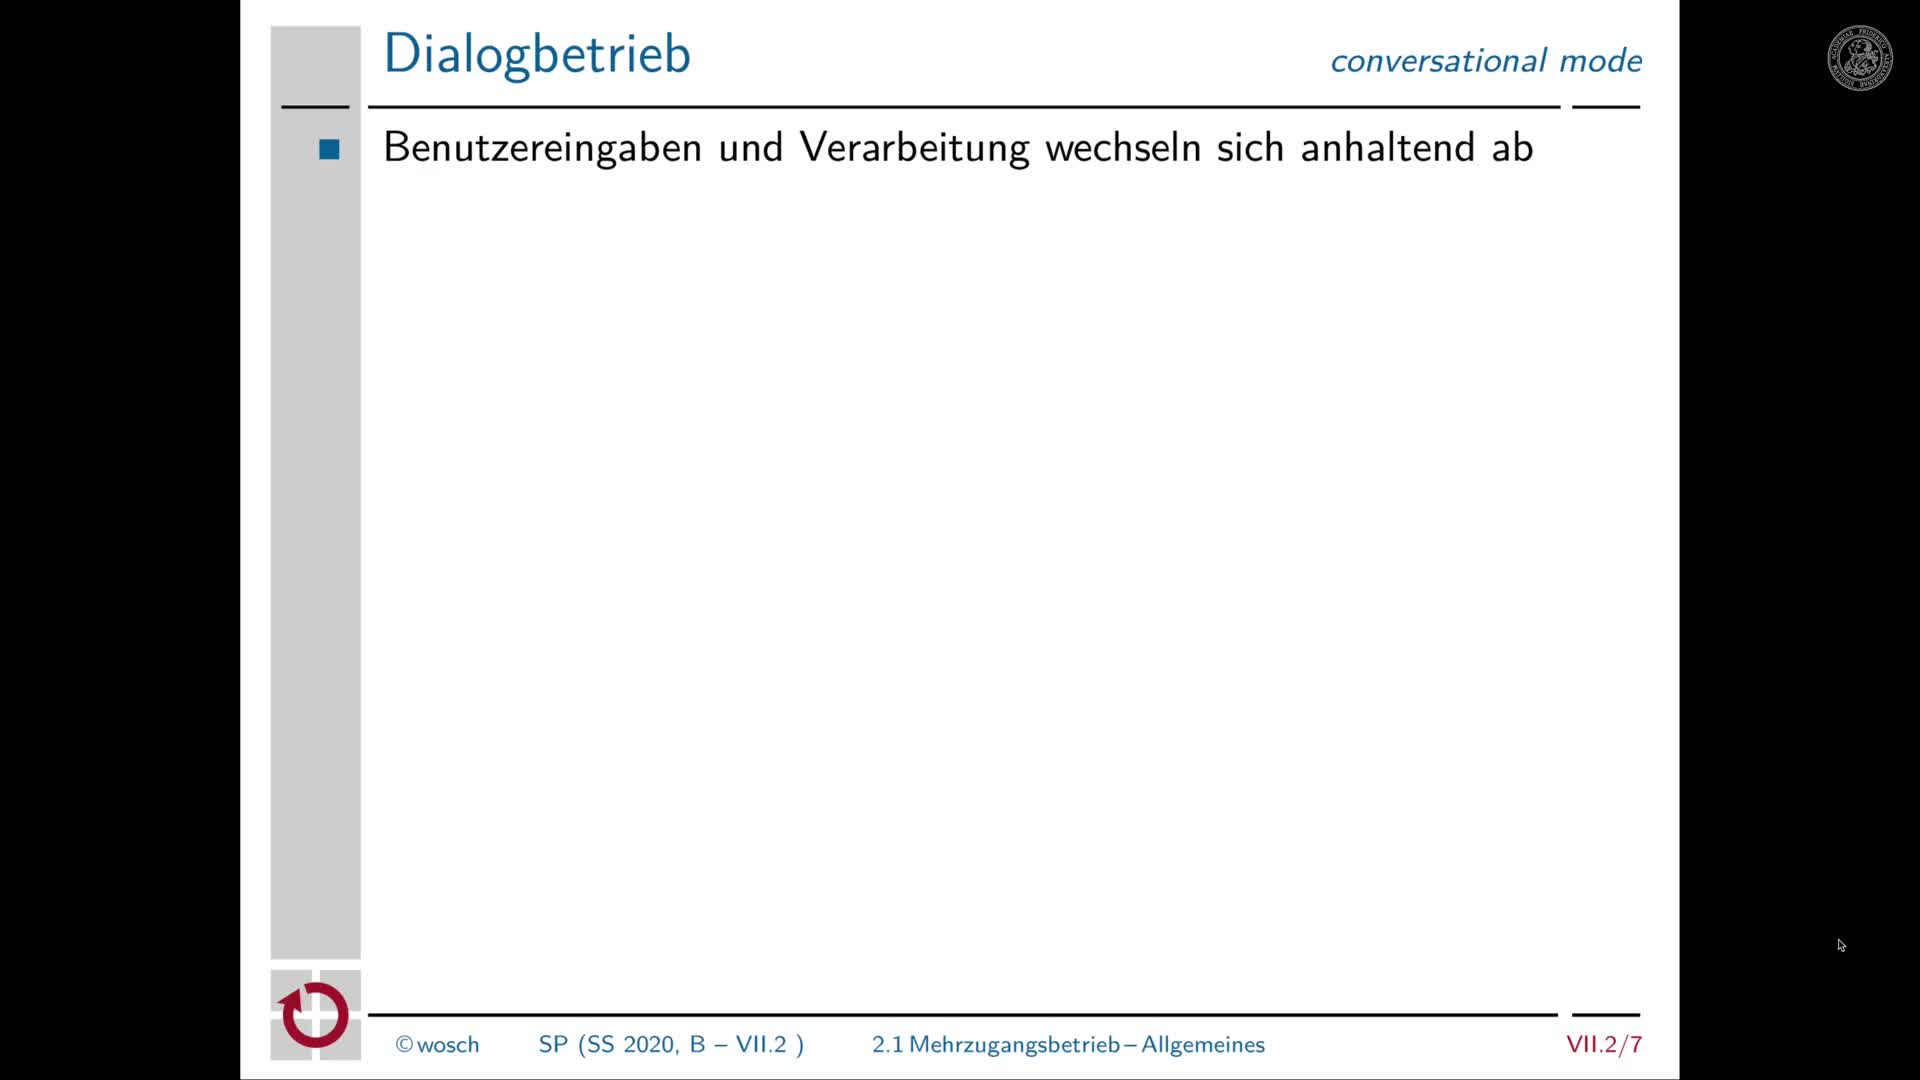 7.2.3 Dialogverarbeitung: Mehrzugangsbetrieb preview image